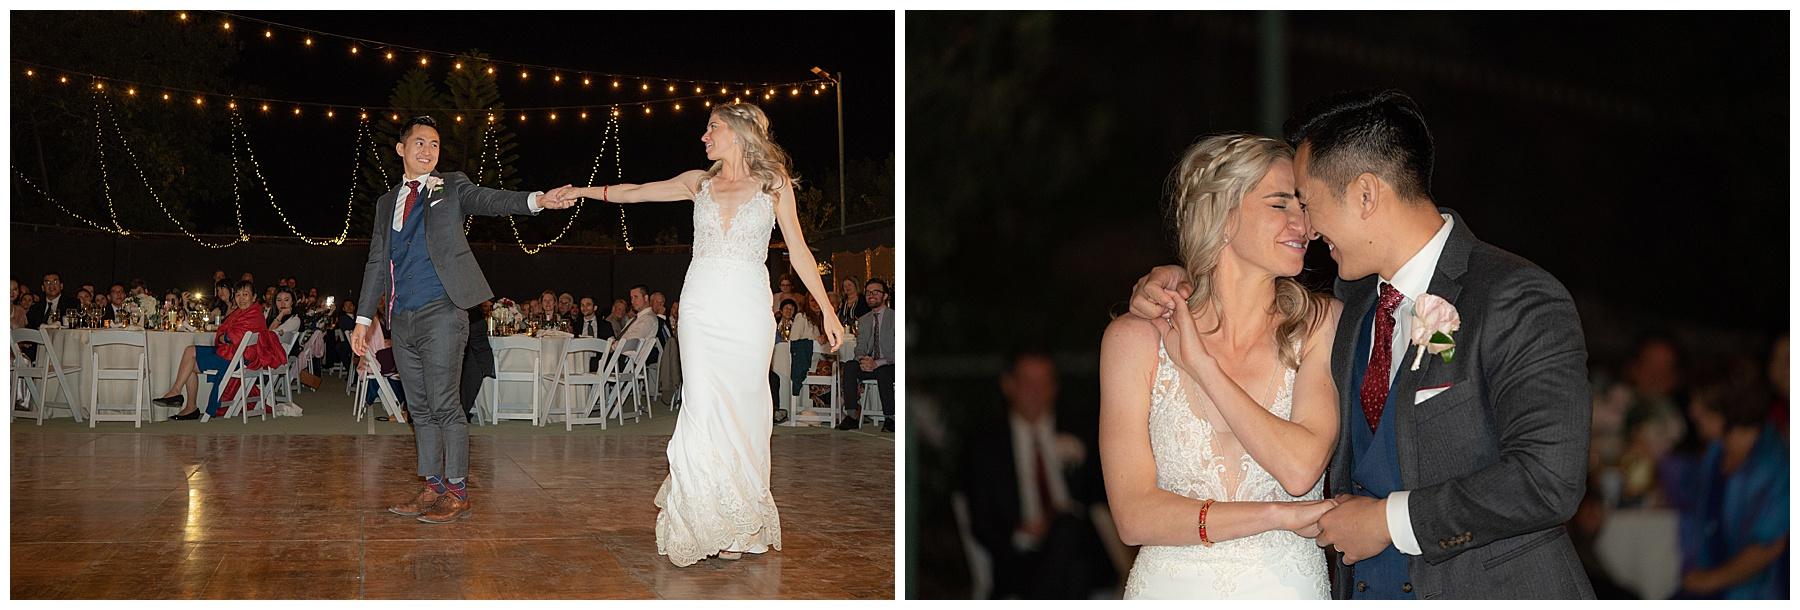 first dance corona wedding